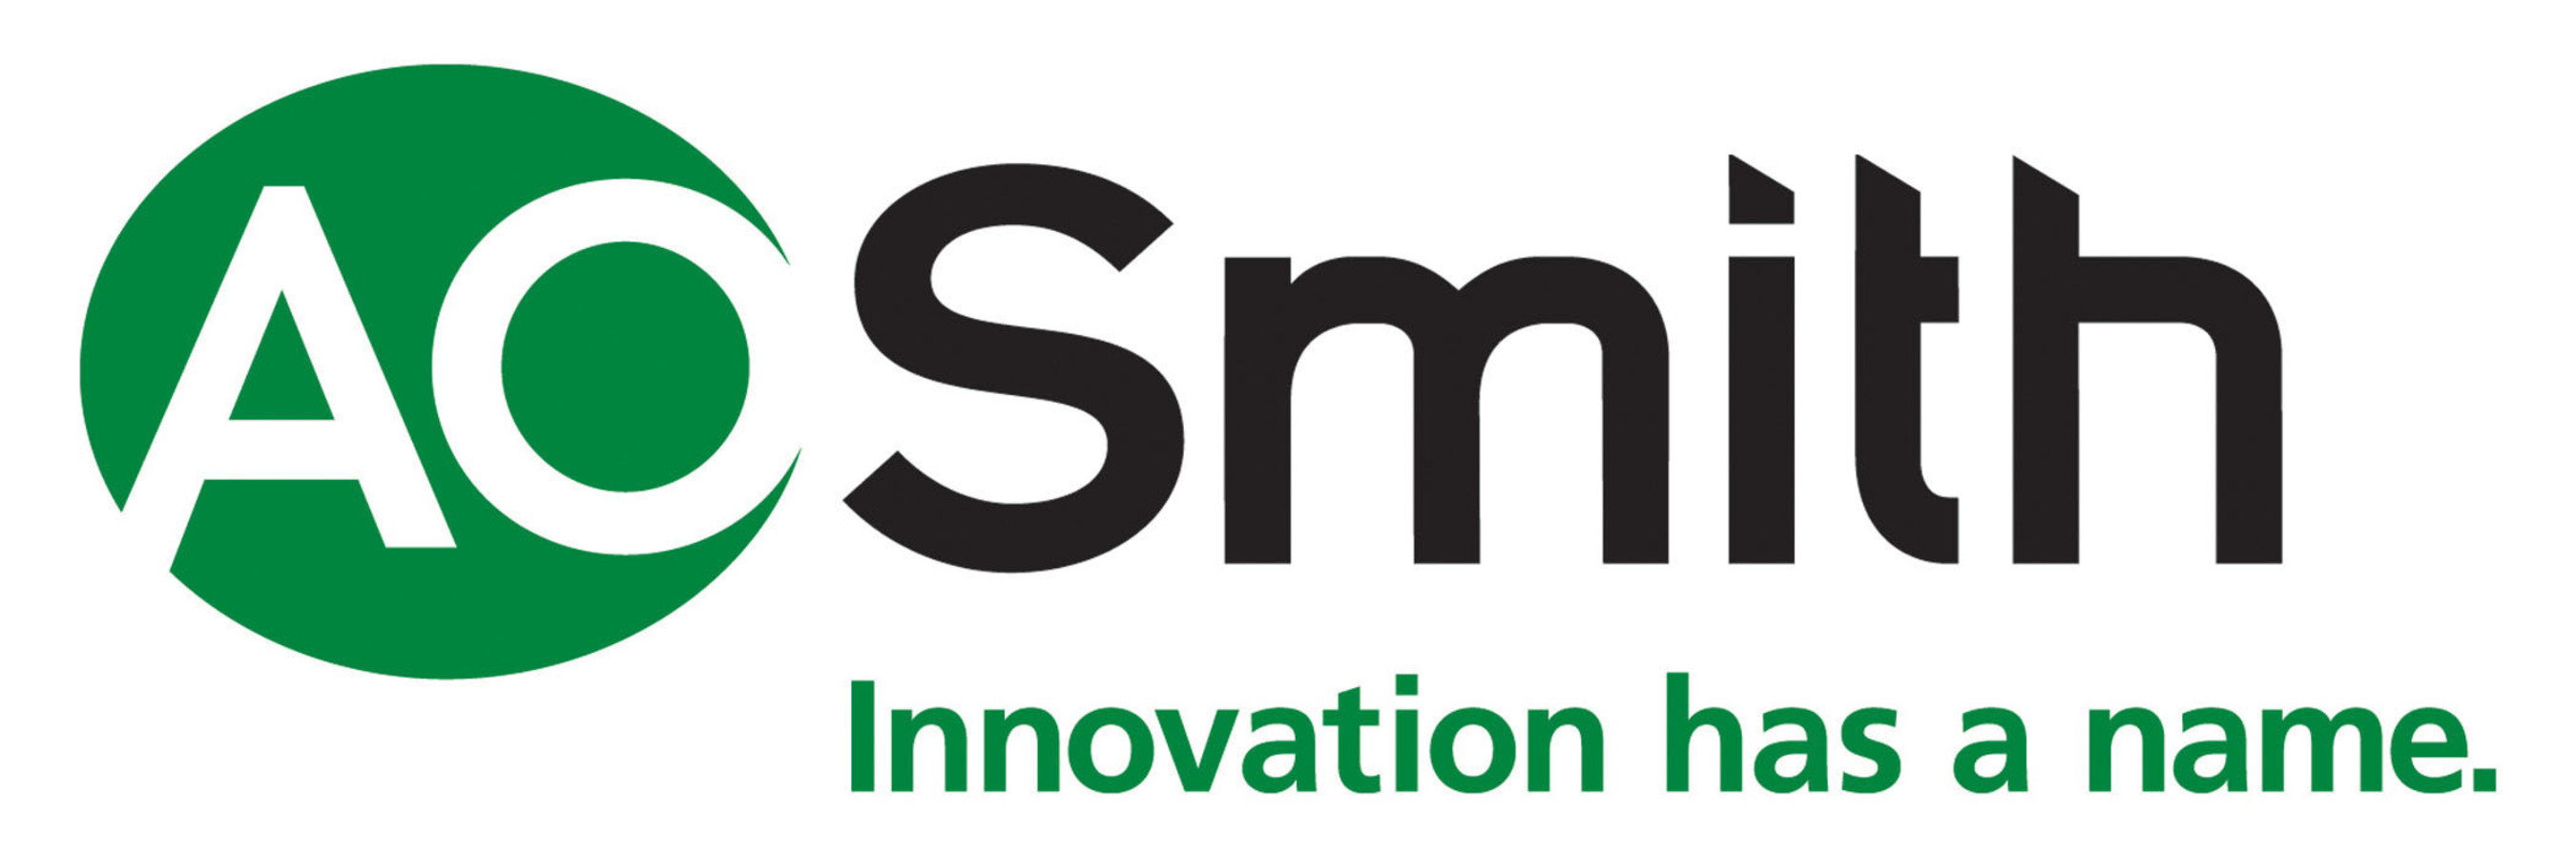 A. O. Smith Corporation logo.